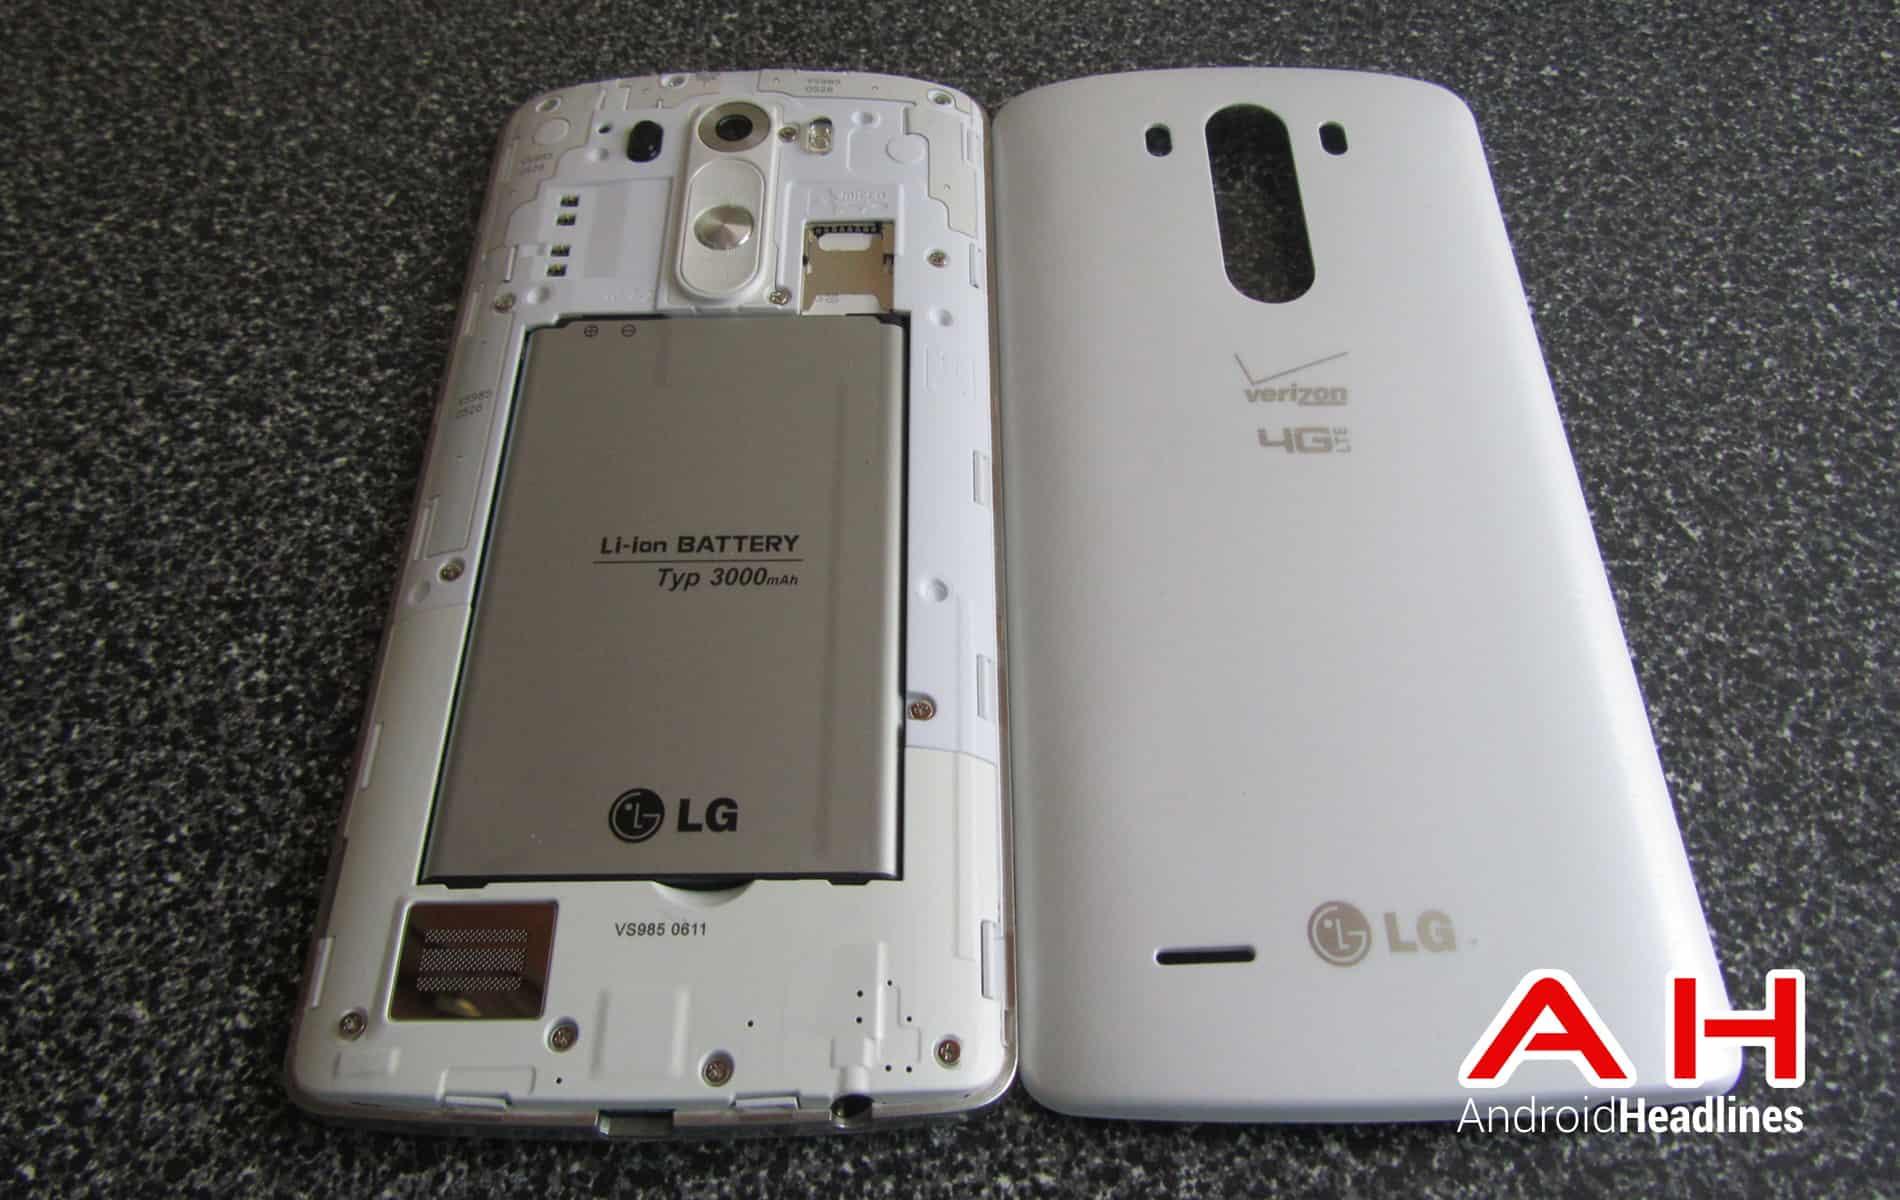 LG G3 Open Back Both AH